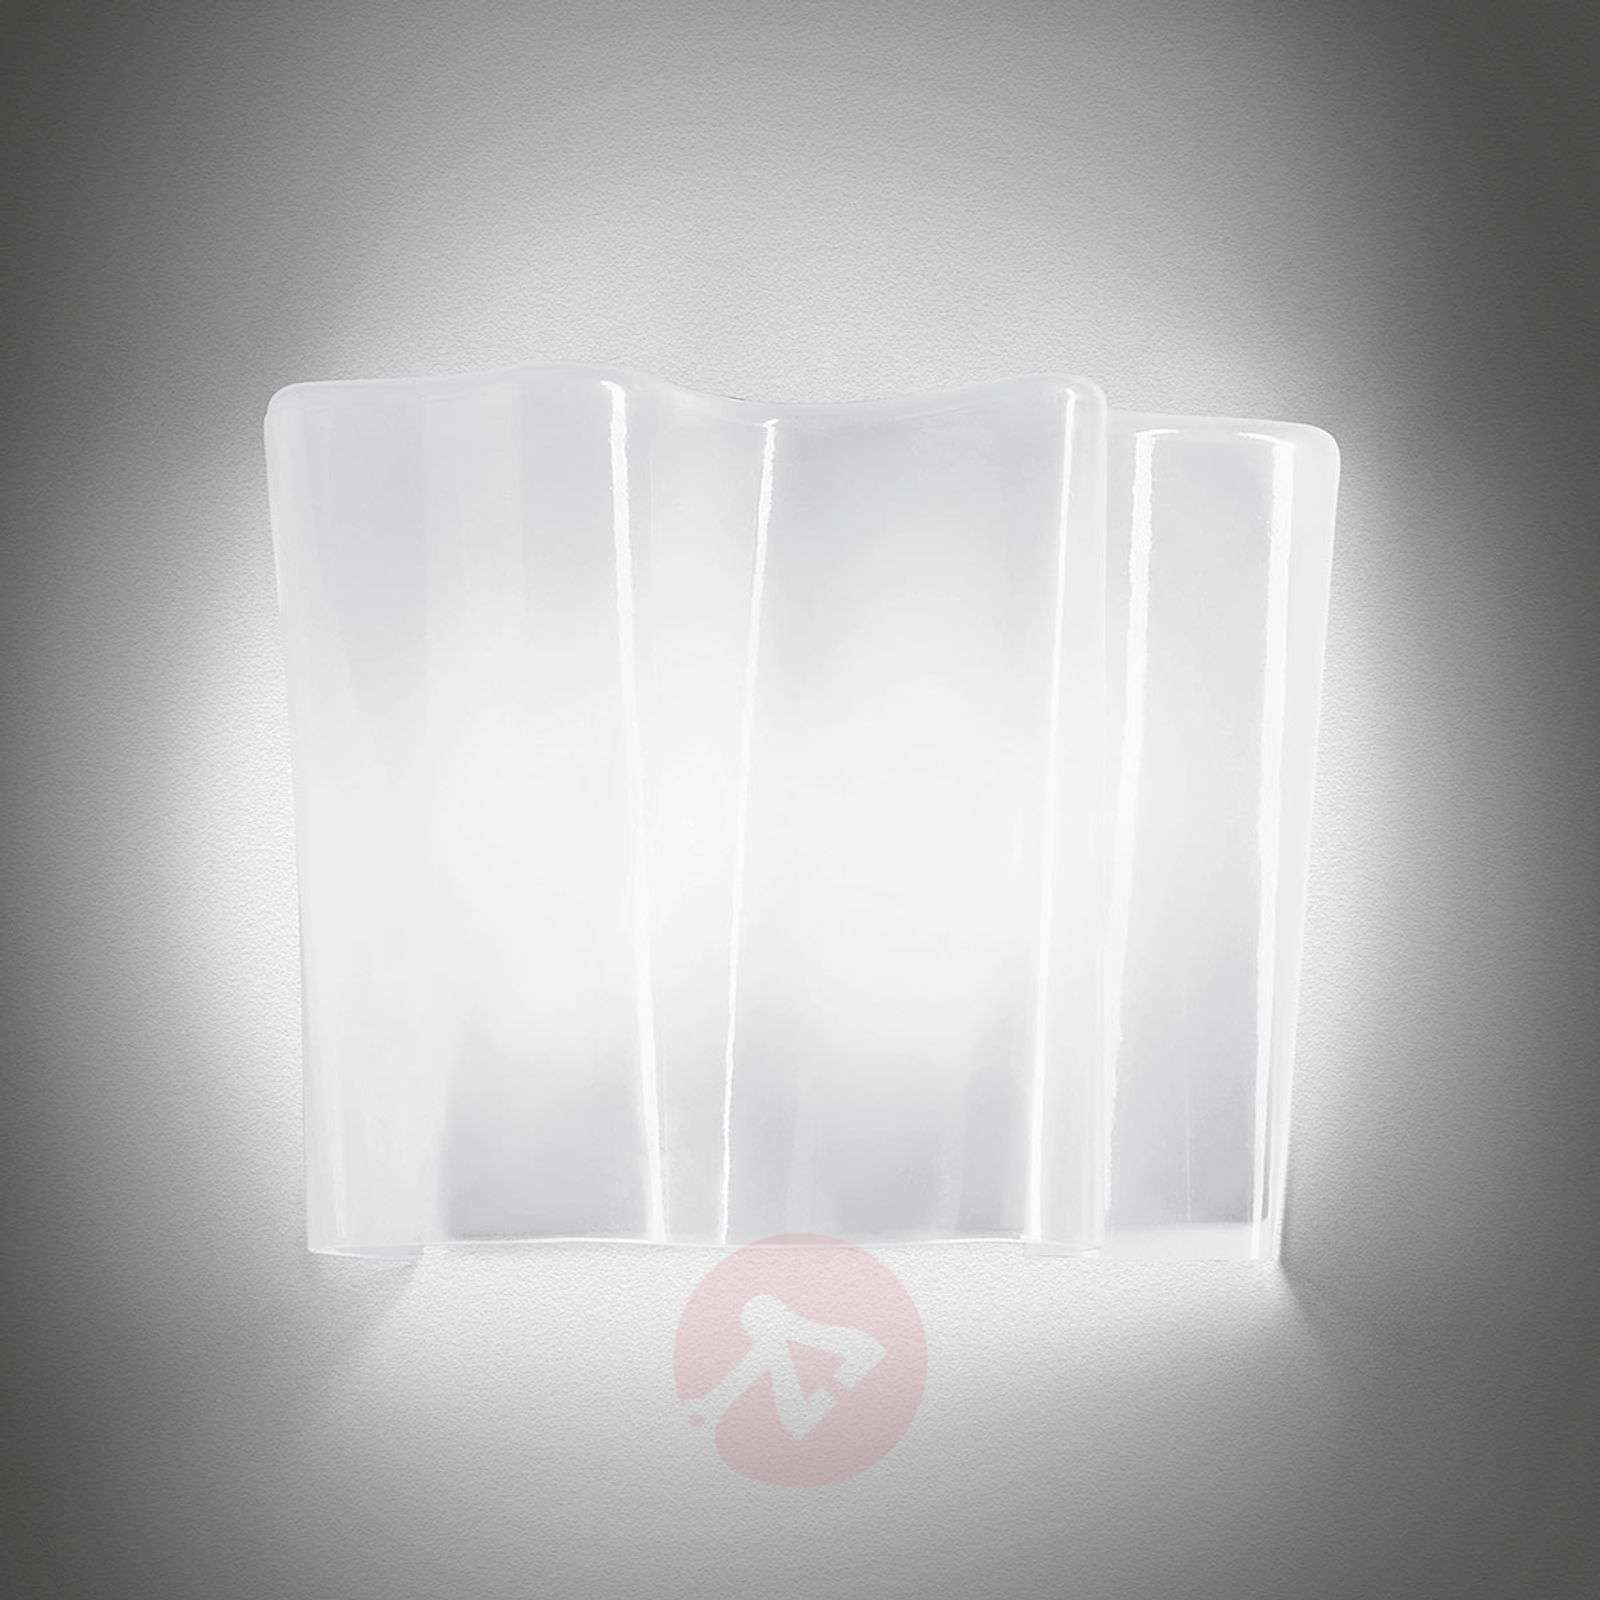 Artemide Logico Micro/Mini seinävalaisin-1060178X-01